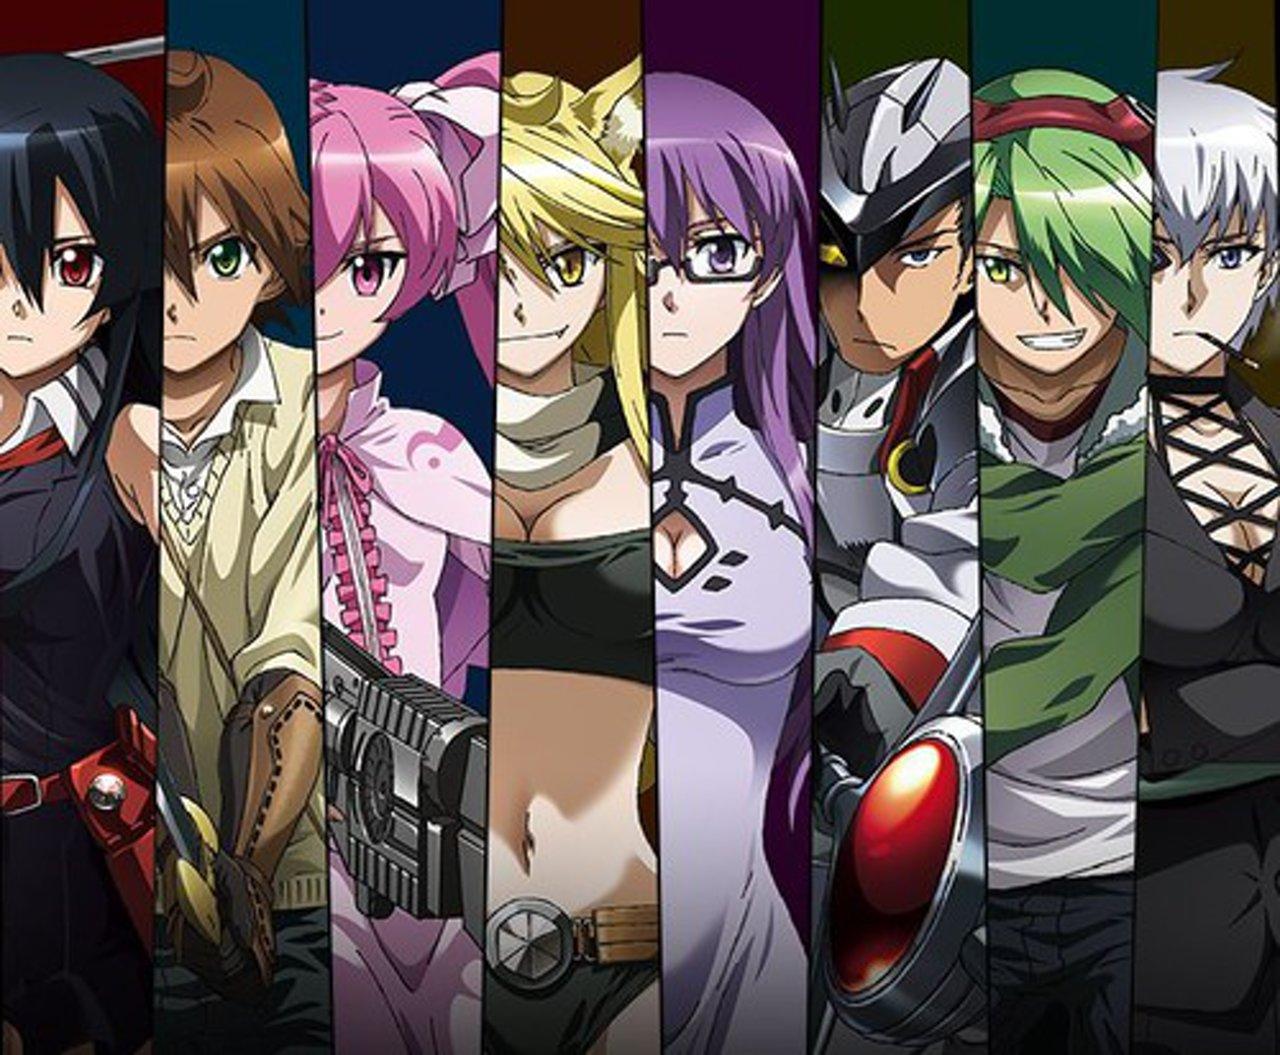 Anime akame ga kill 4k wallpapers hd provides you an amazing collection of wallpapers for your smartphones. Akame Ga Kill! wallpapers, Anime, HQ Akame Ga Kill ...